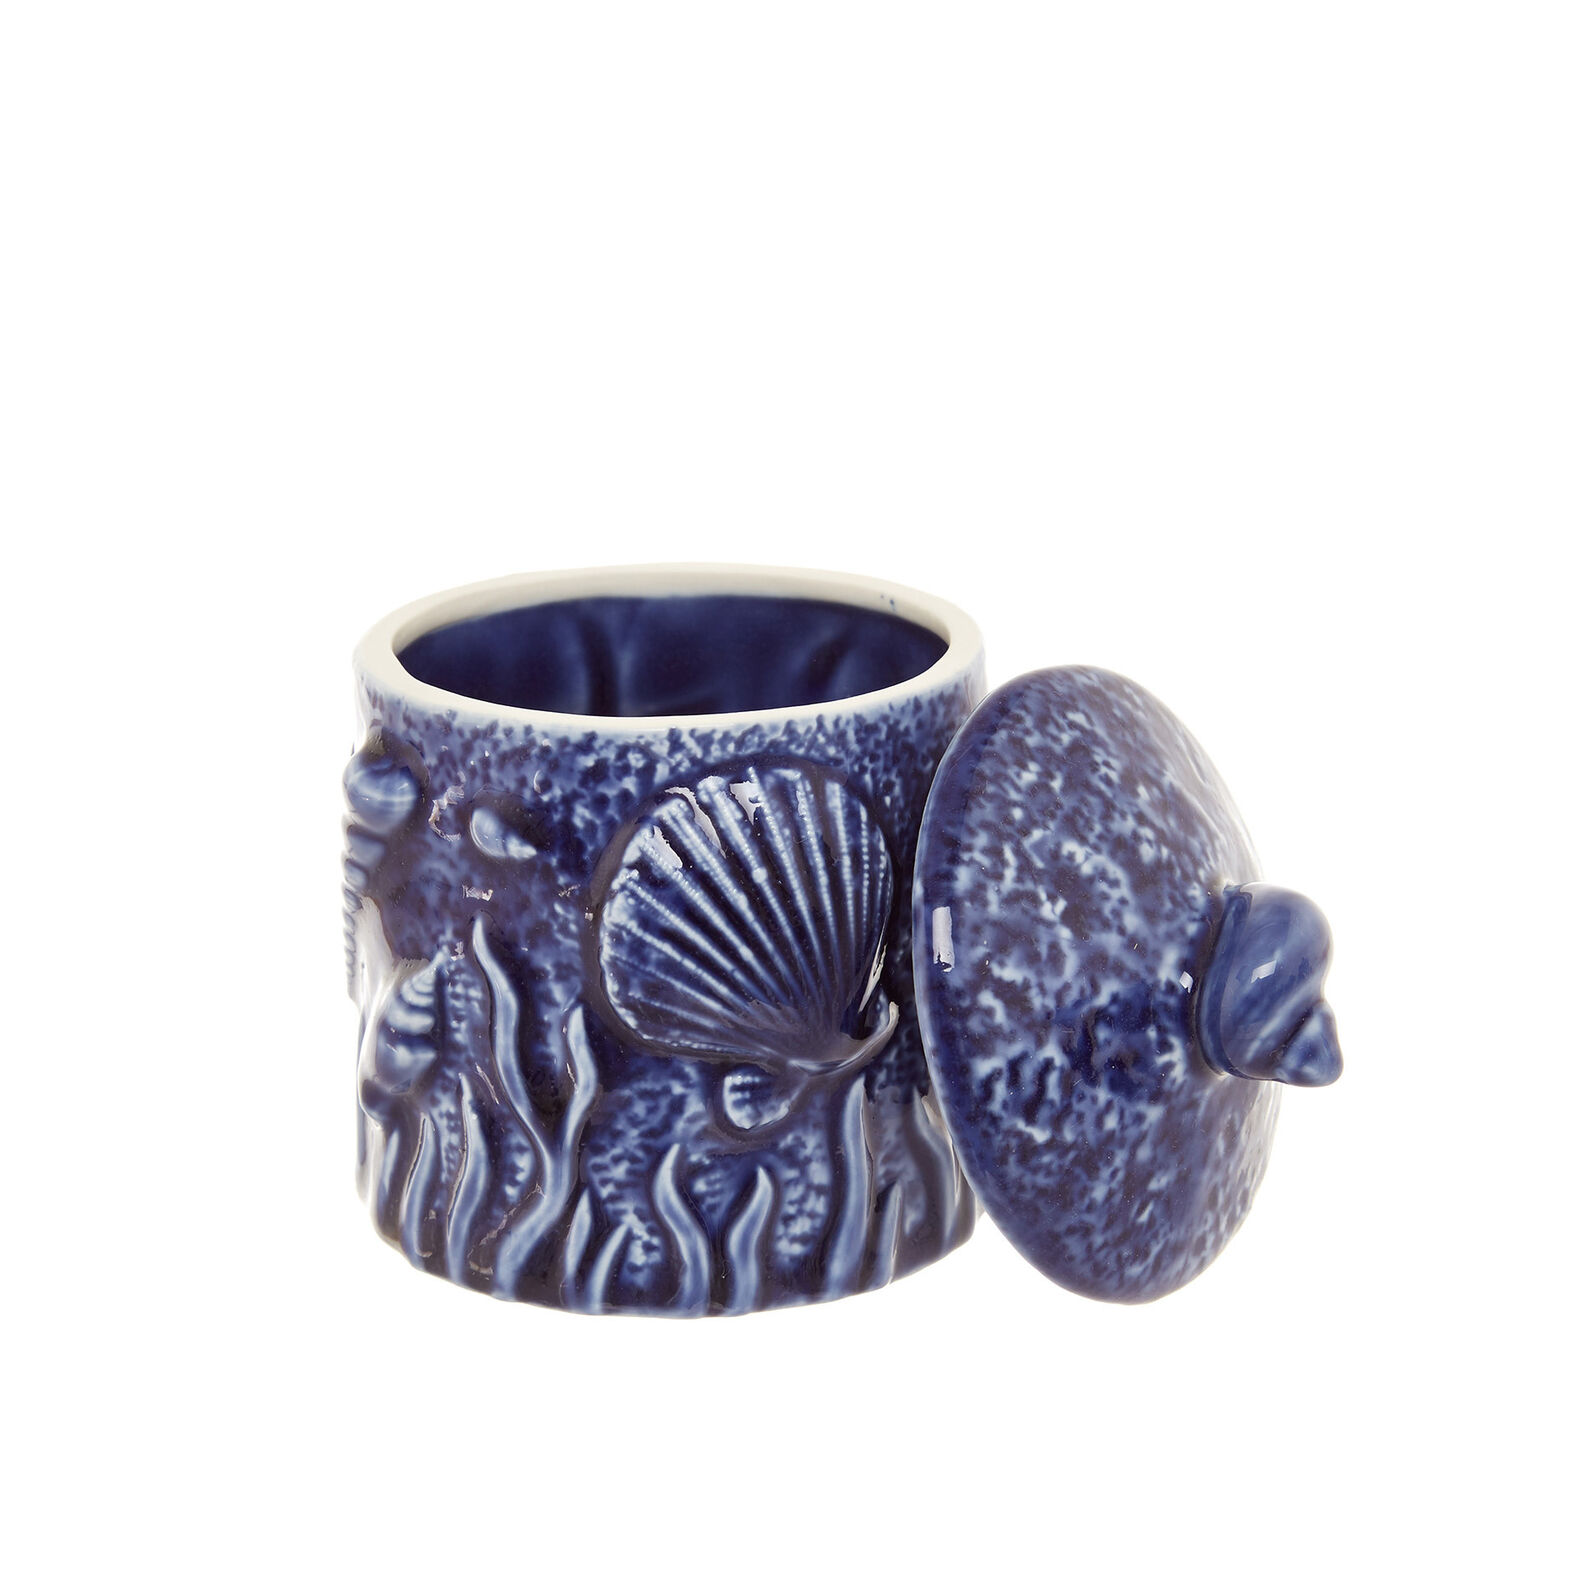 Porcelain jar with marine decoration